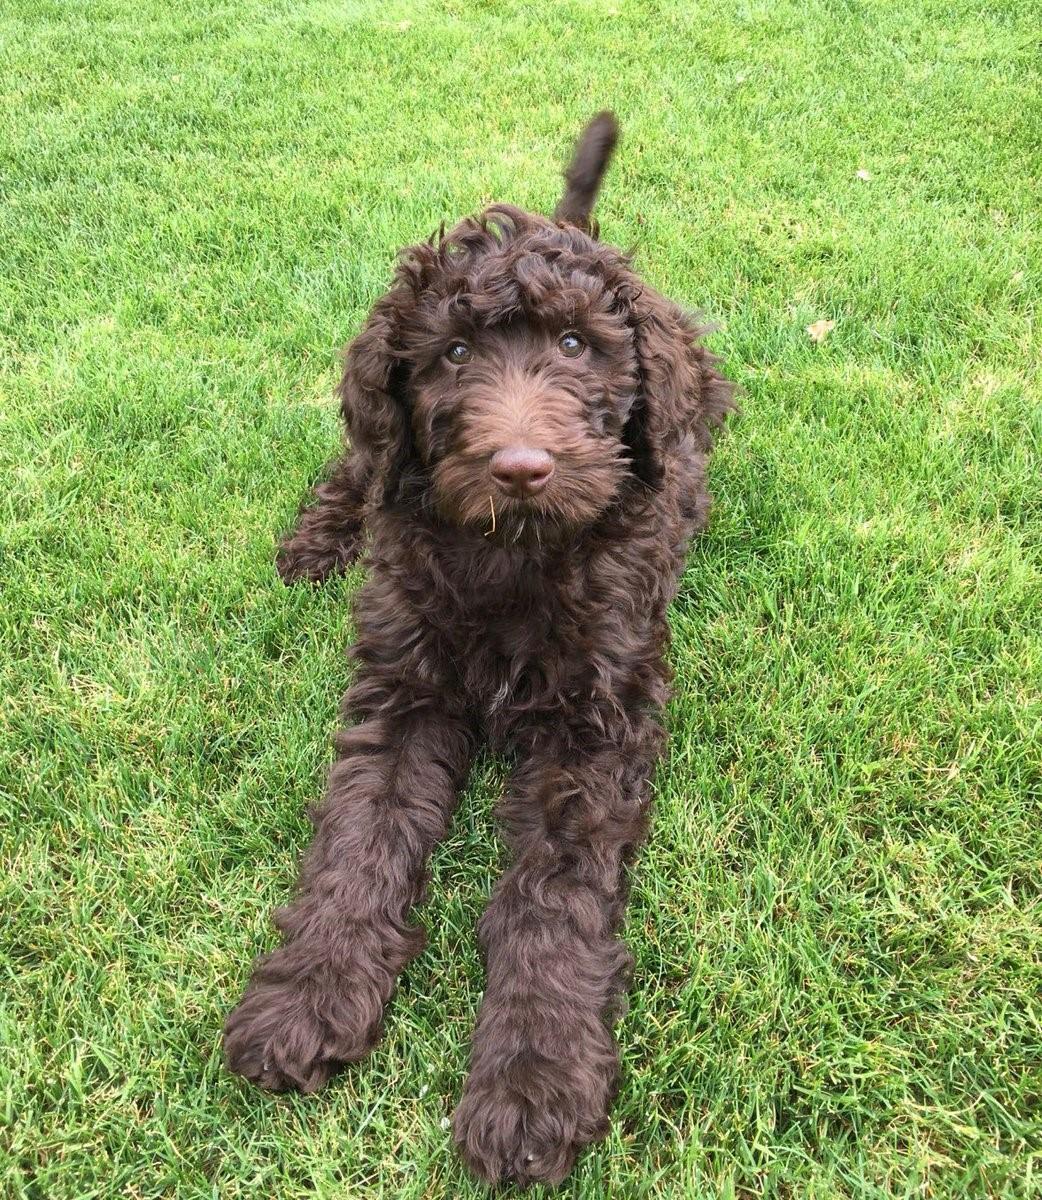 #goldendoodle #doodledogtraining #puppytraining #litchfieldparkdogtraining